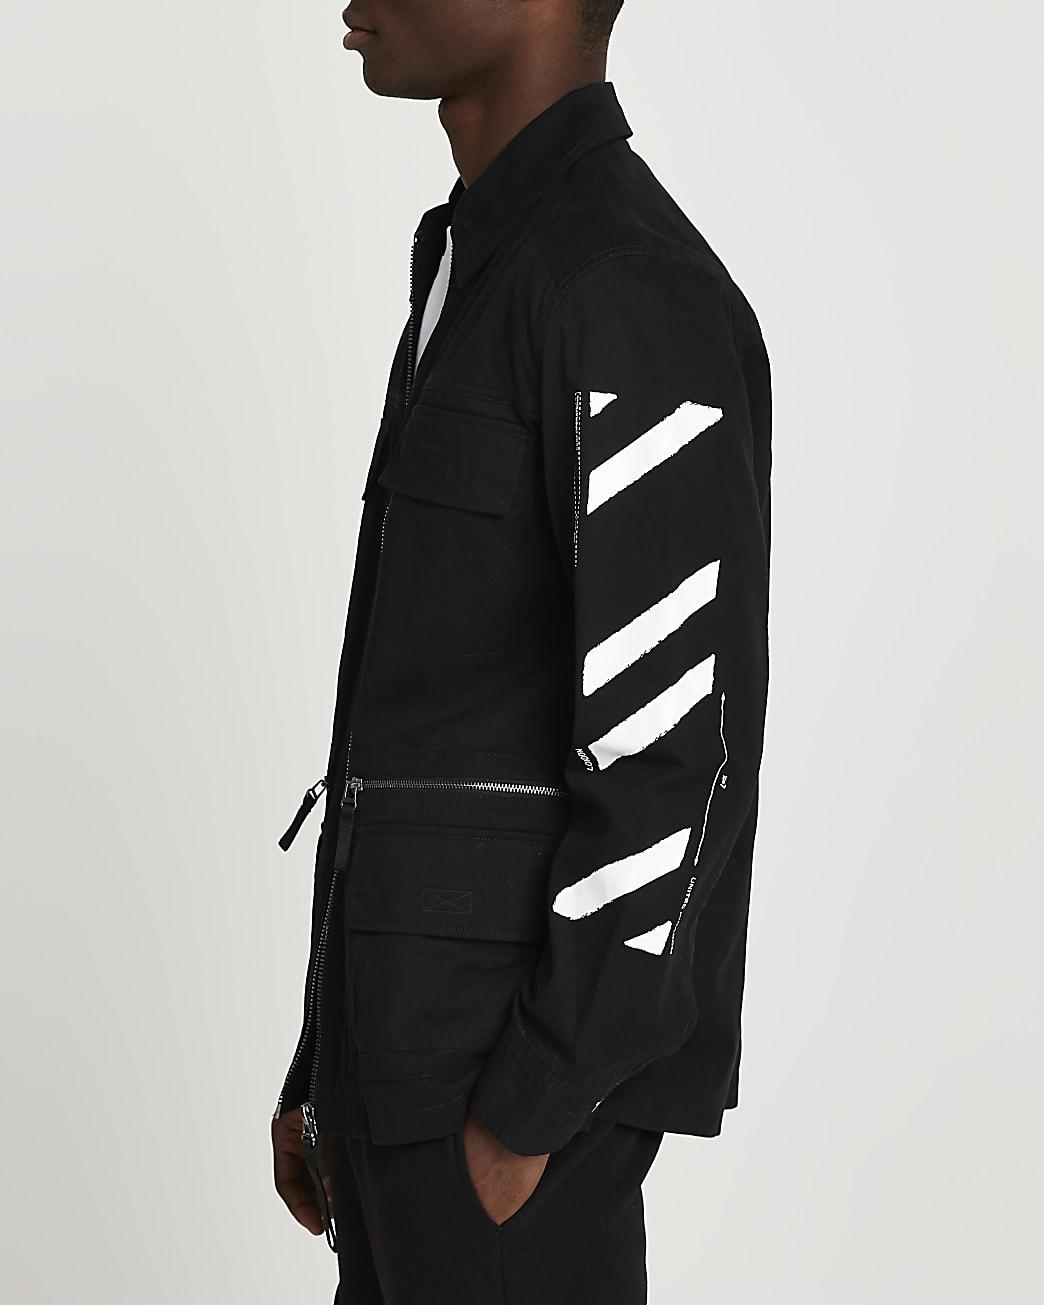 Black field jacket with sleeve print